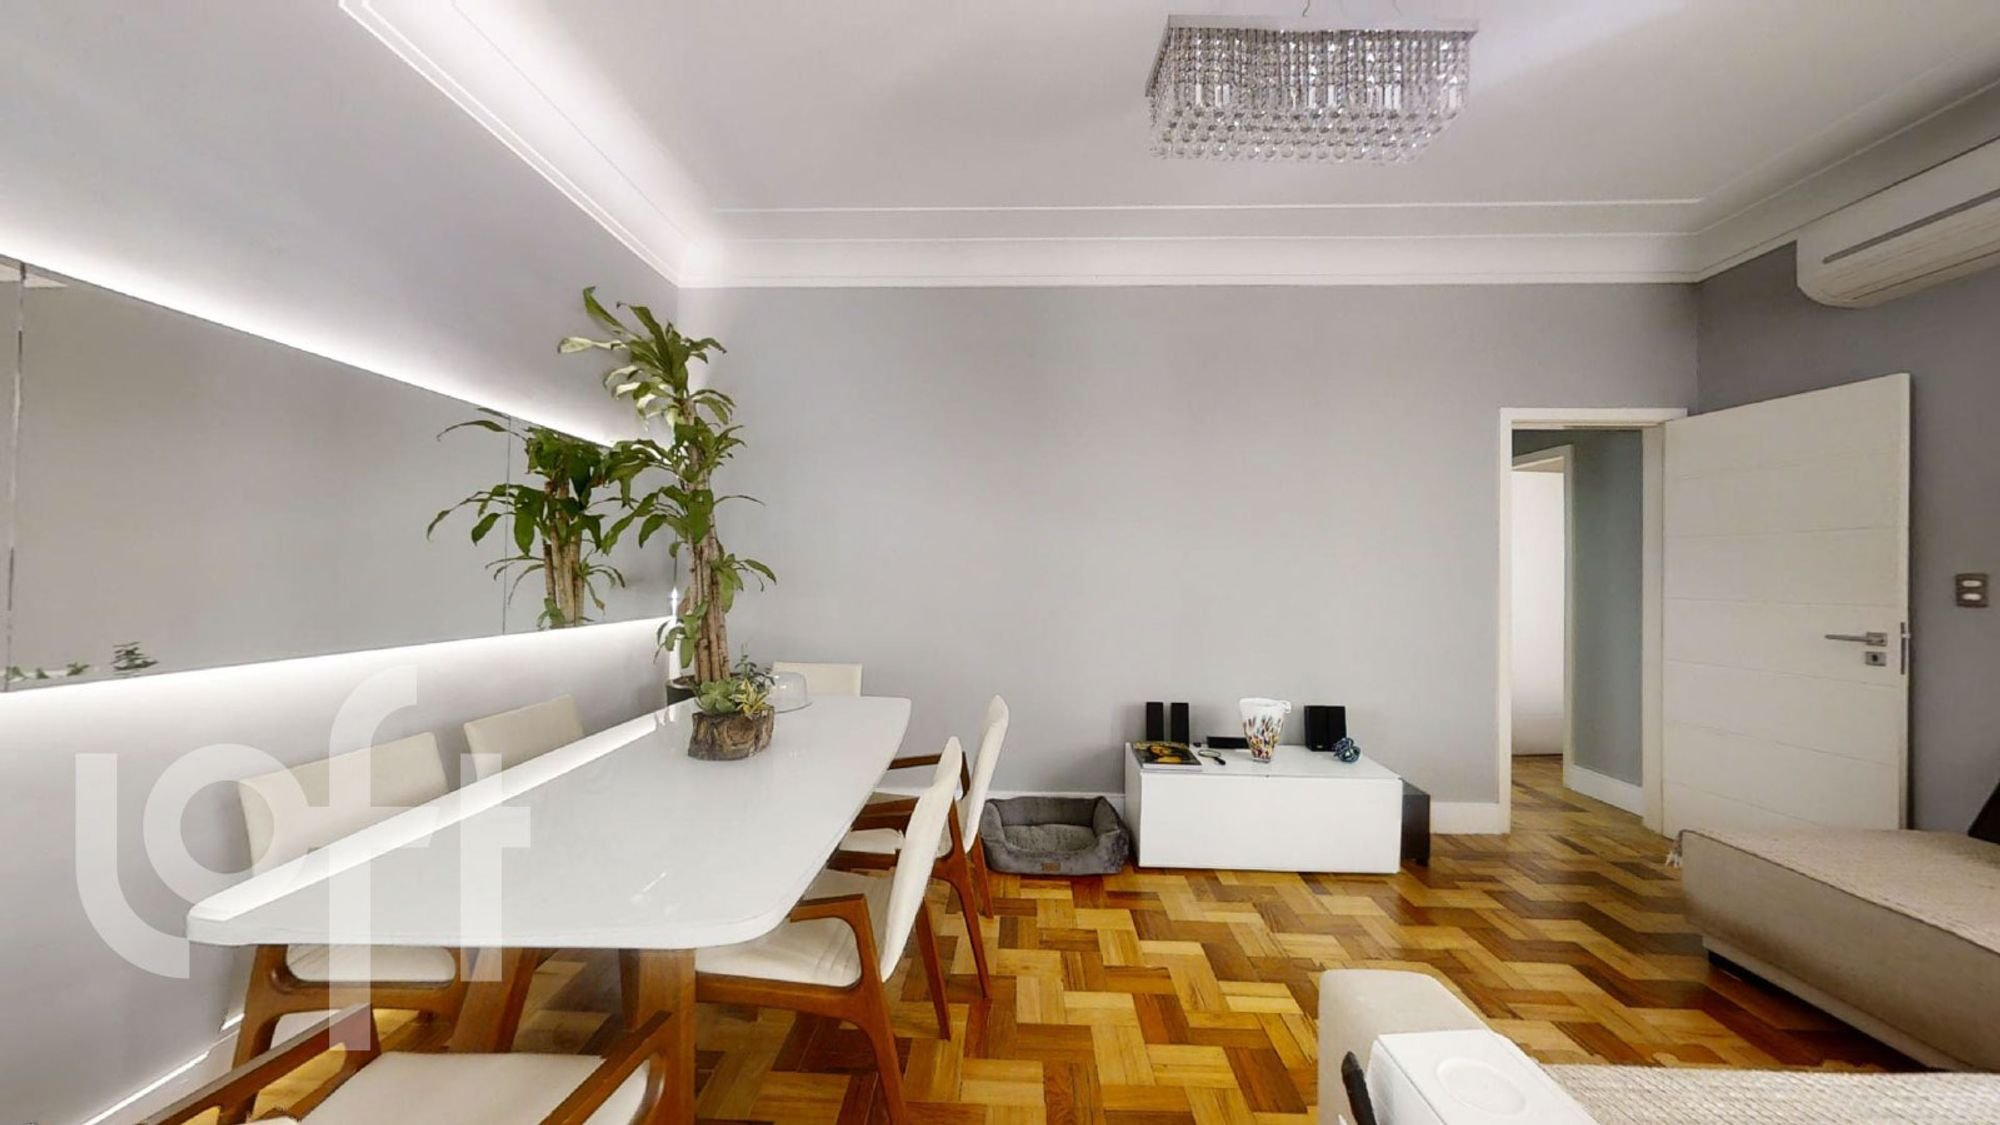 Foto de Sala com vaso de planta, vaso, cadeira